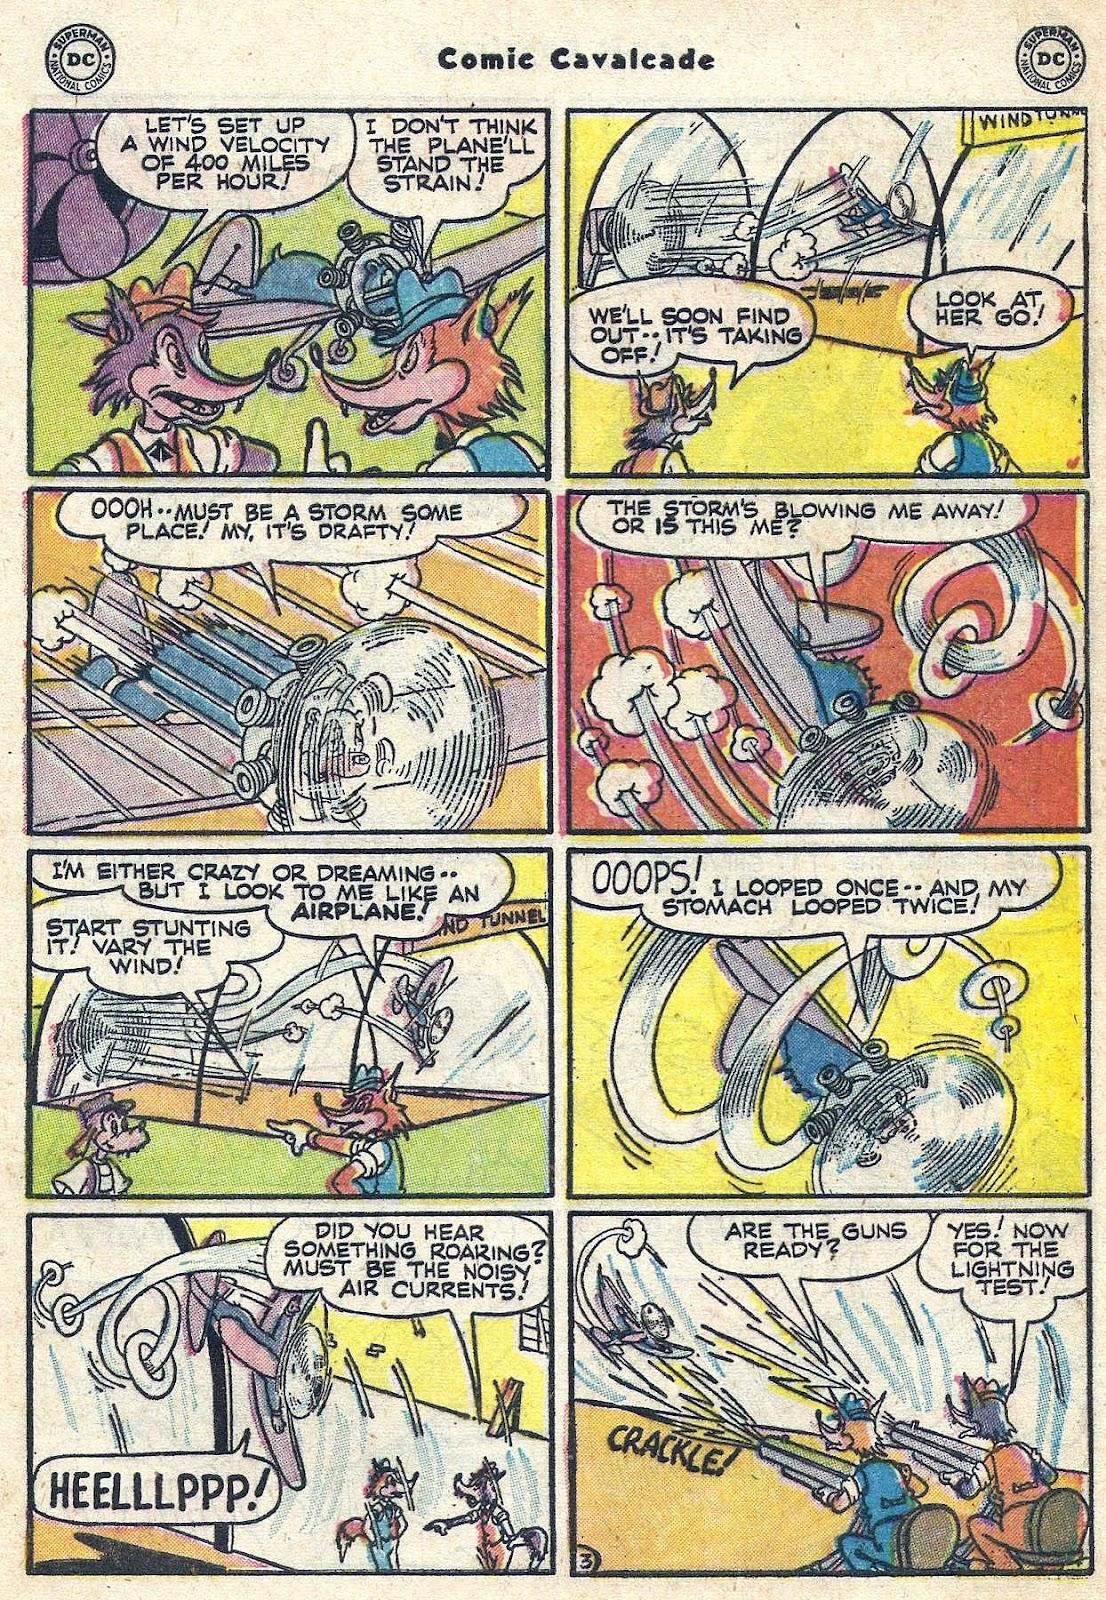 Comic Cavalcade issue 56 - Page 55